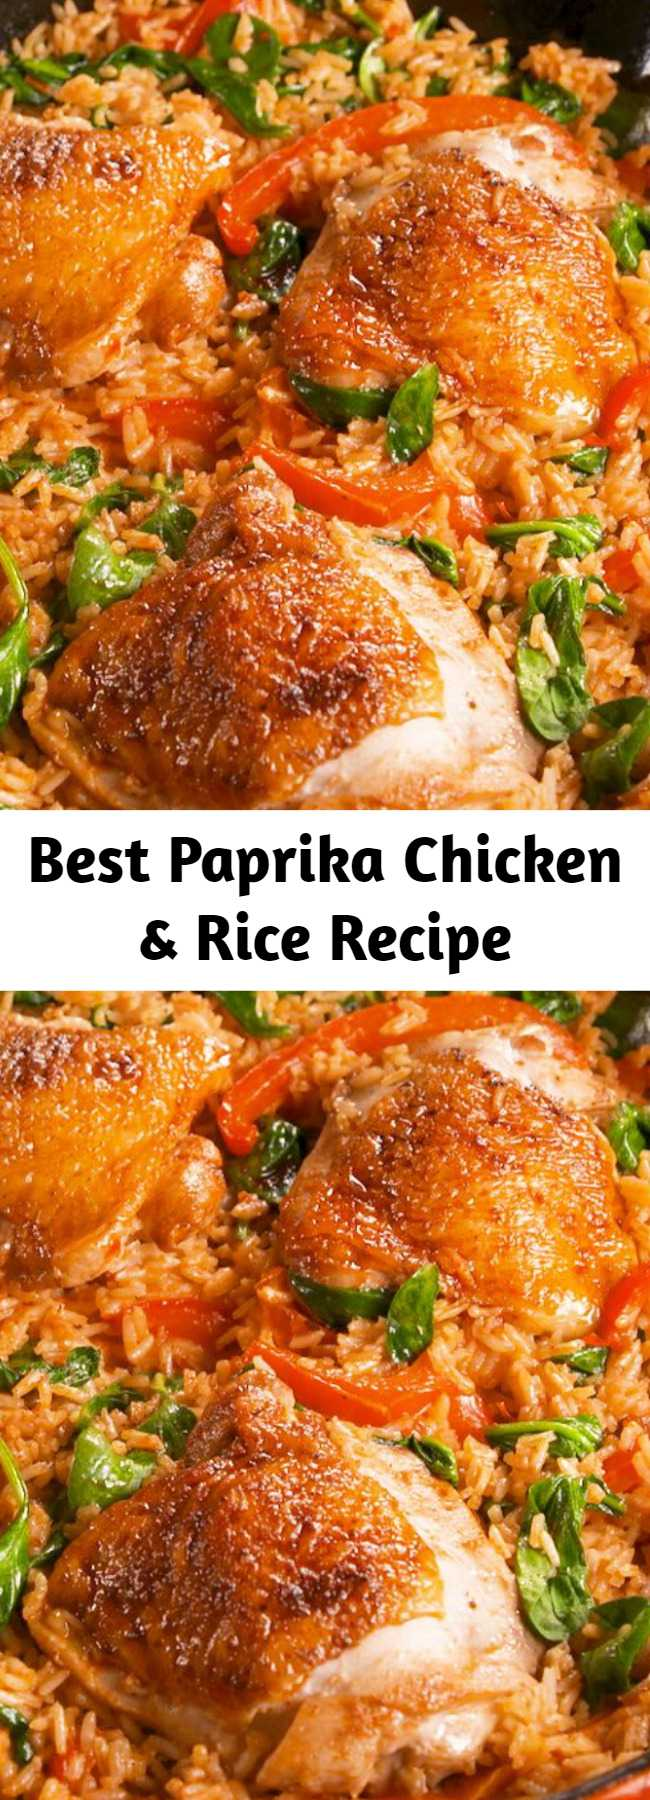 Best Paprika Chicken & Rice Recipe - Weeknight dinner all-star. #food #easyrecipe #dinner #familydinner #chicken